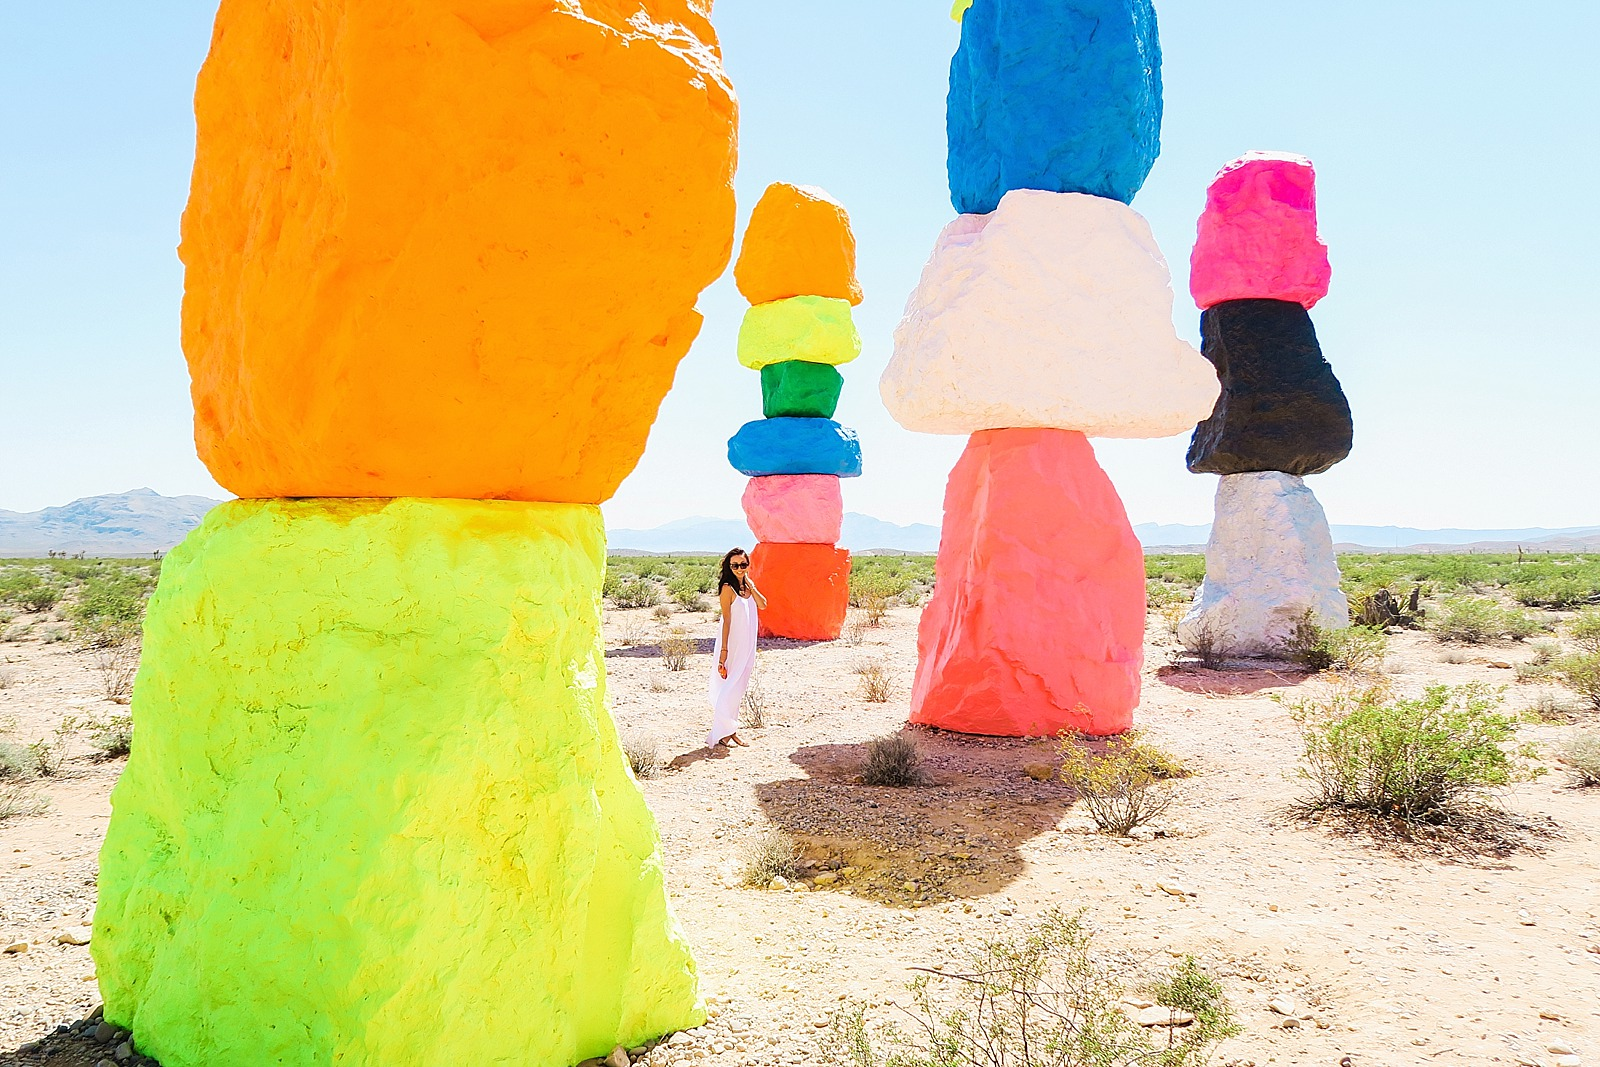 las-vegas-travel-blogger-trip-arizona-diana-elizabeth-blog-com-seven-magic-mountains-_0016